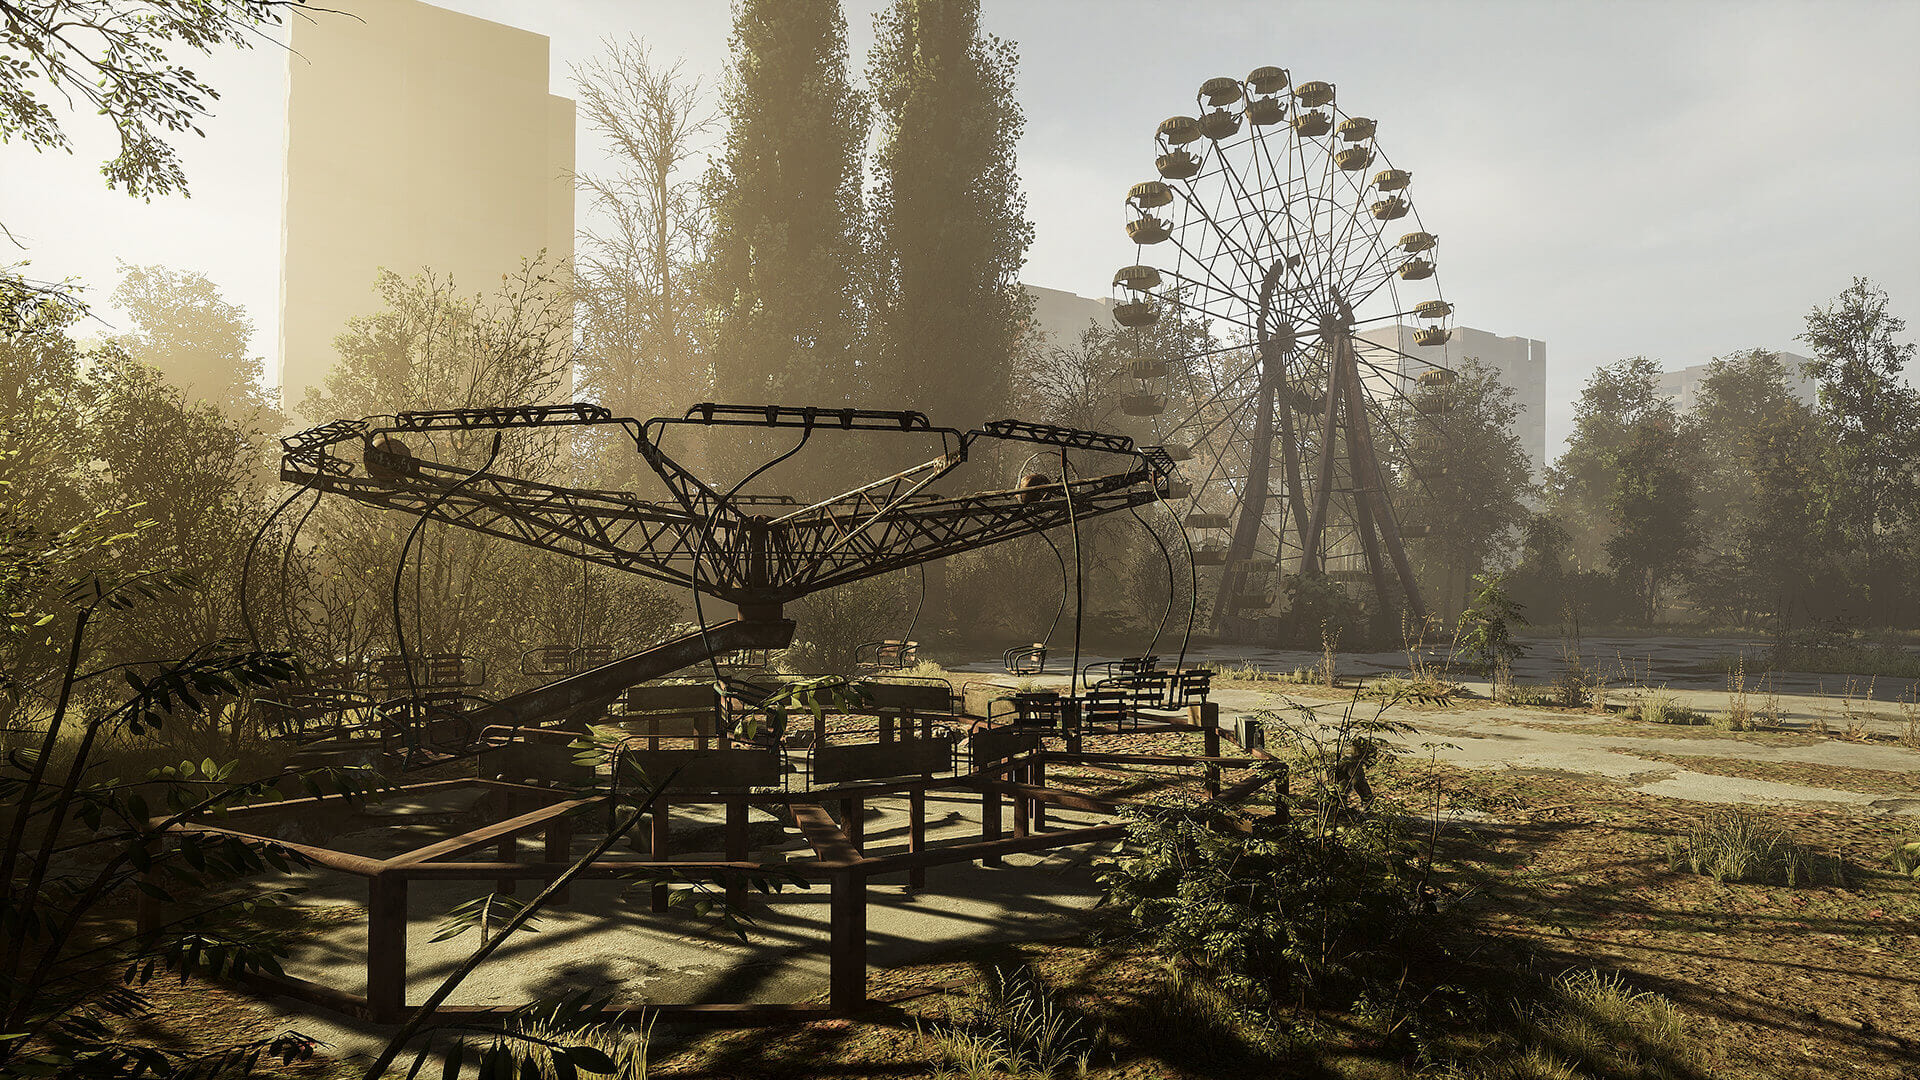 Chernobylite Pripyat Central